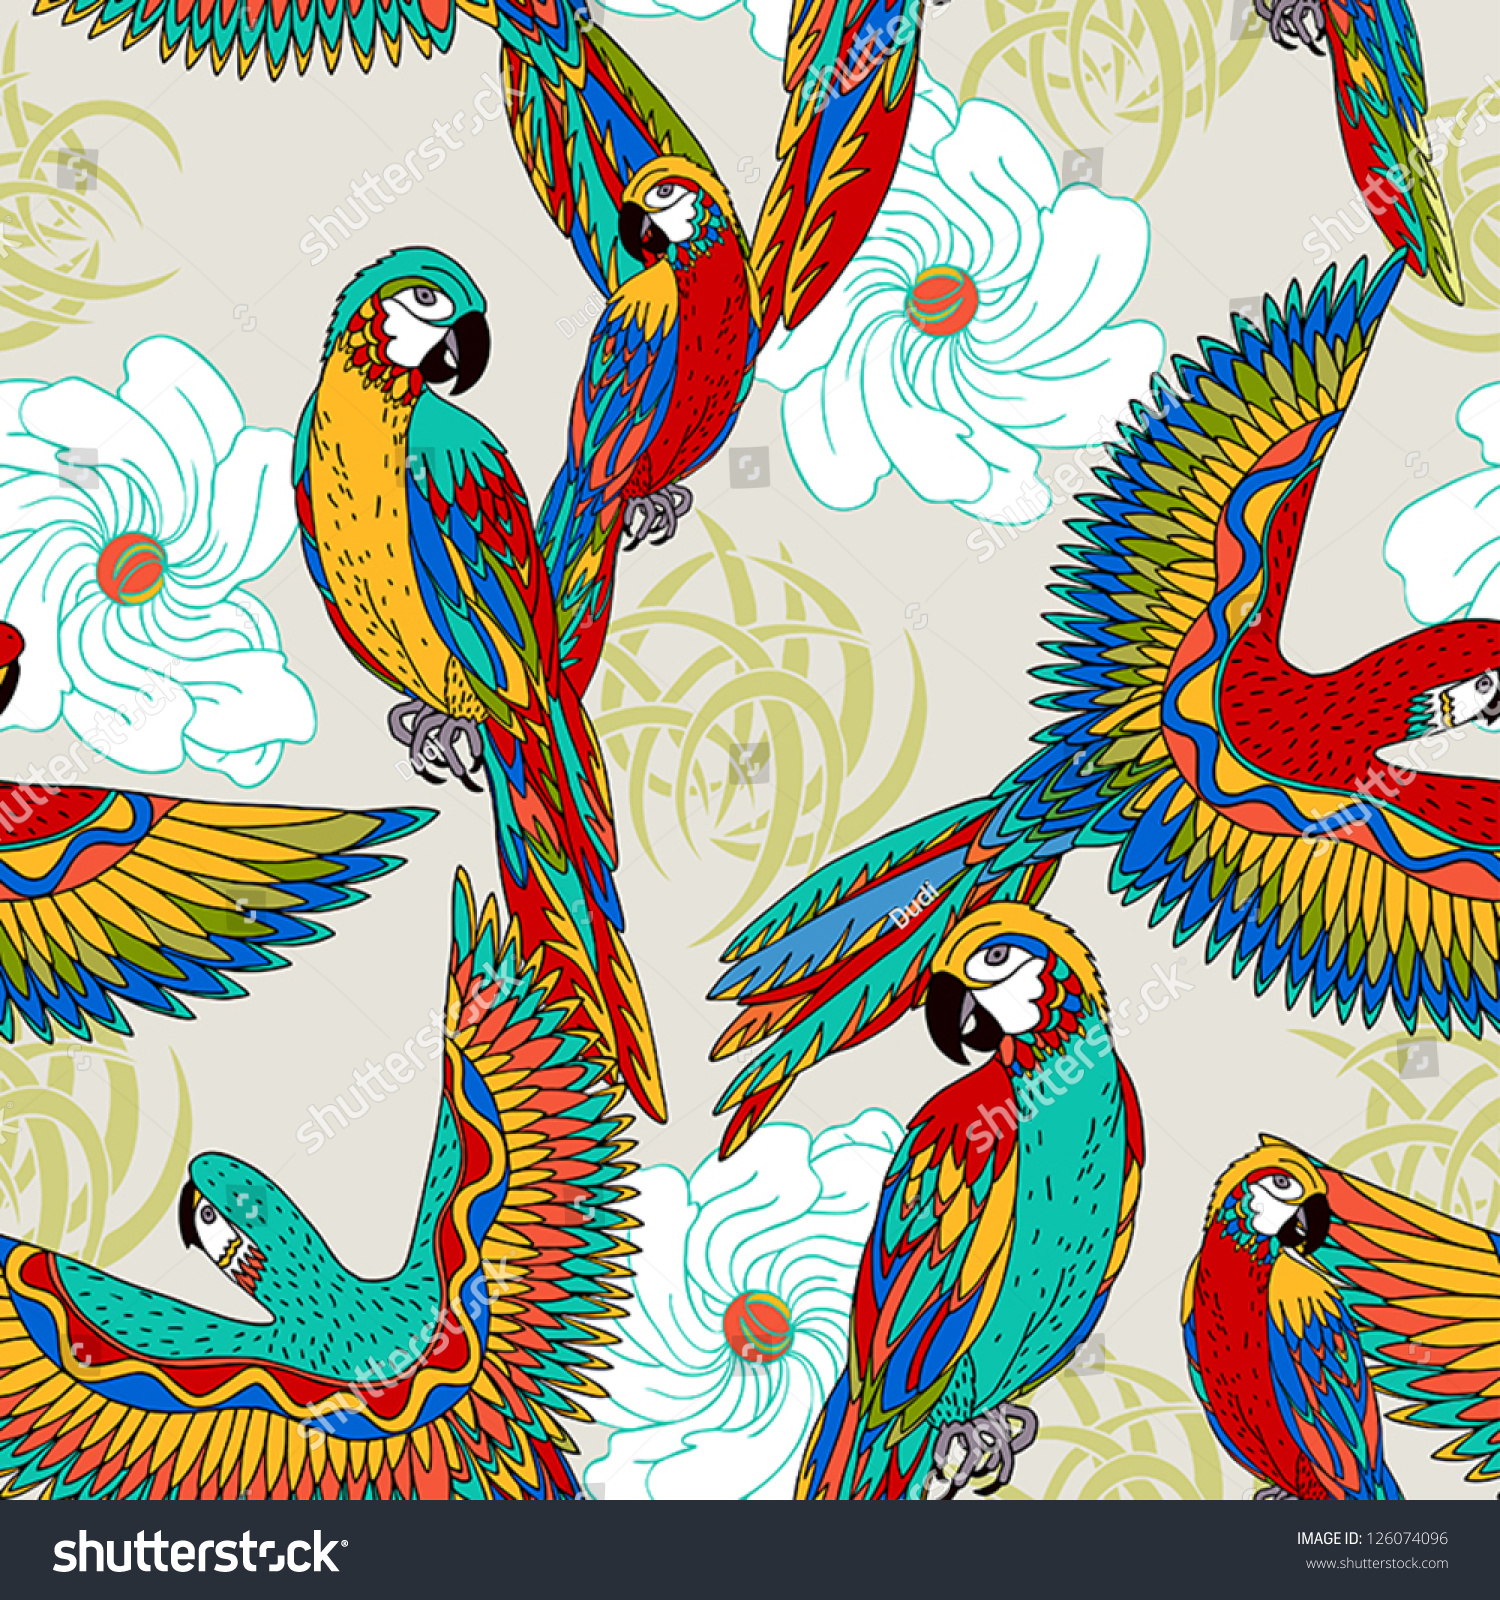 Vintage Beach Background Stock Photo 112981333: Vintage Colorful Background Parrots Theme Exotic Stock